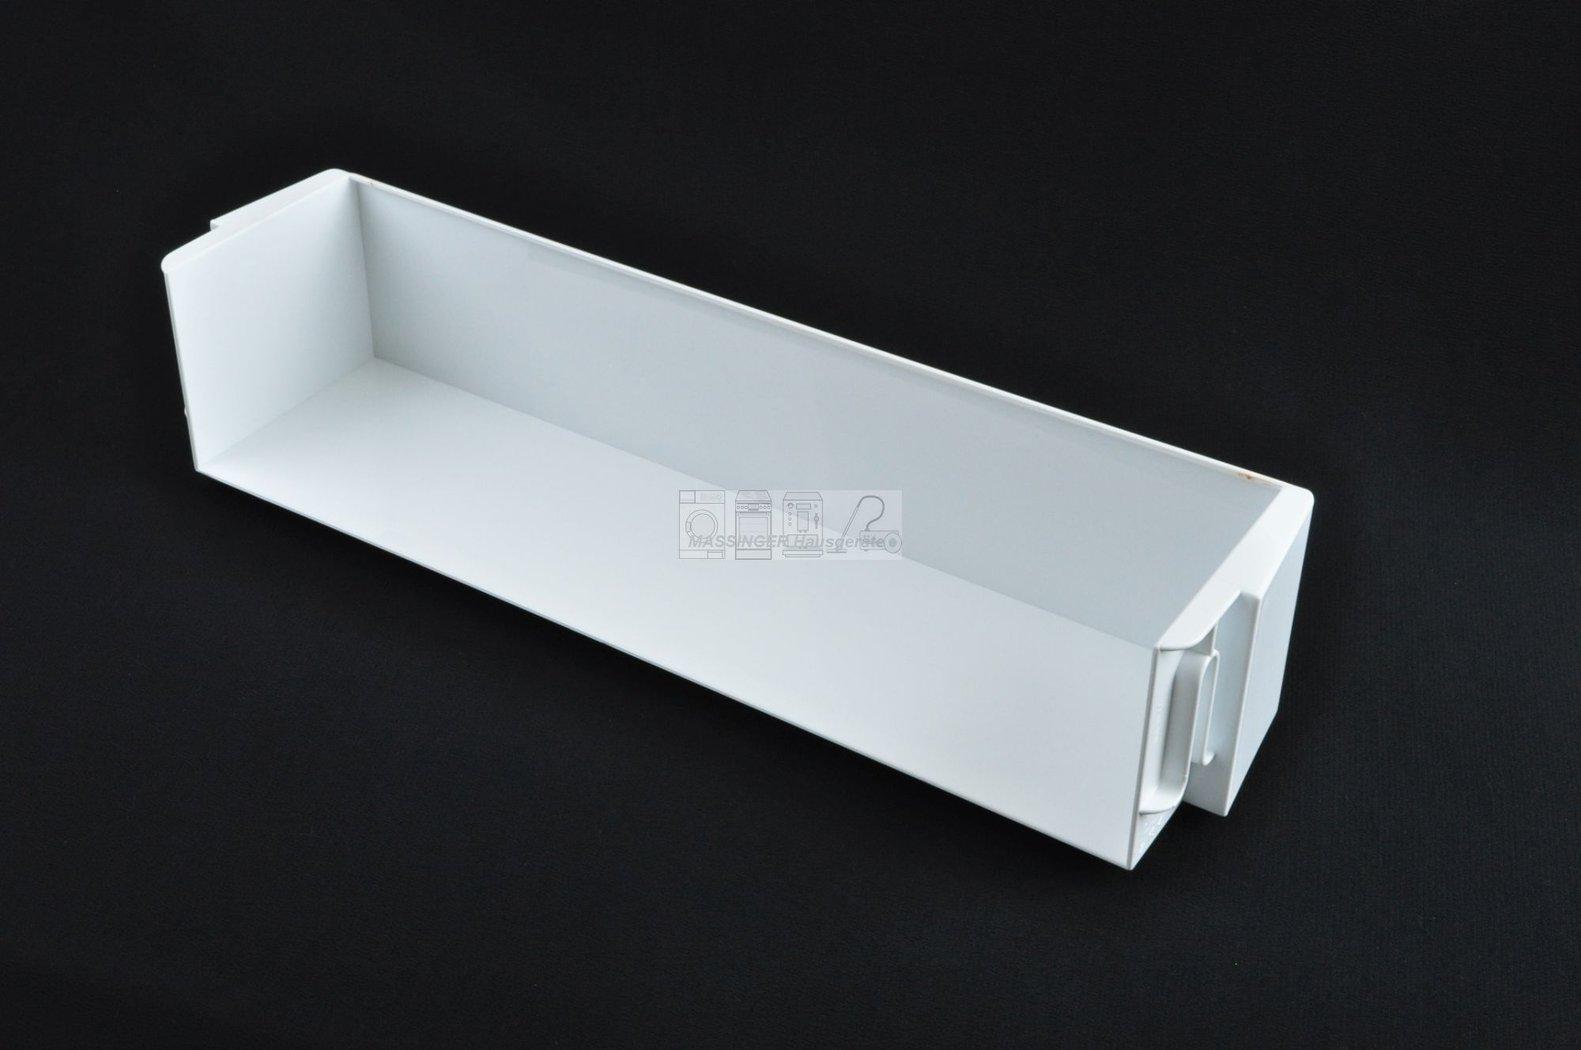 Mini Kühlschrank Dms : Kühlschrank 50 cm waschmaschine 50 cm breit media markt elegant